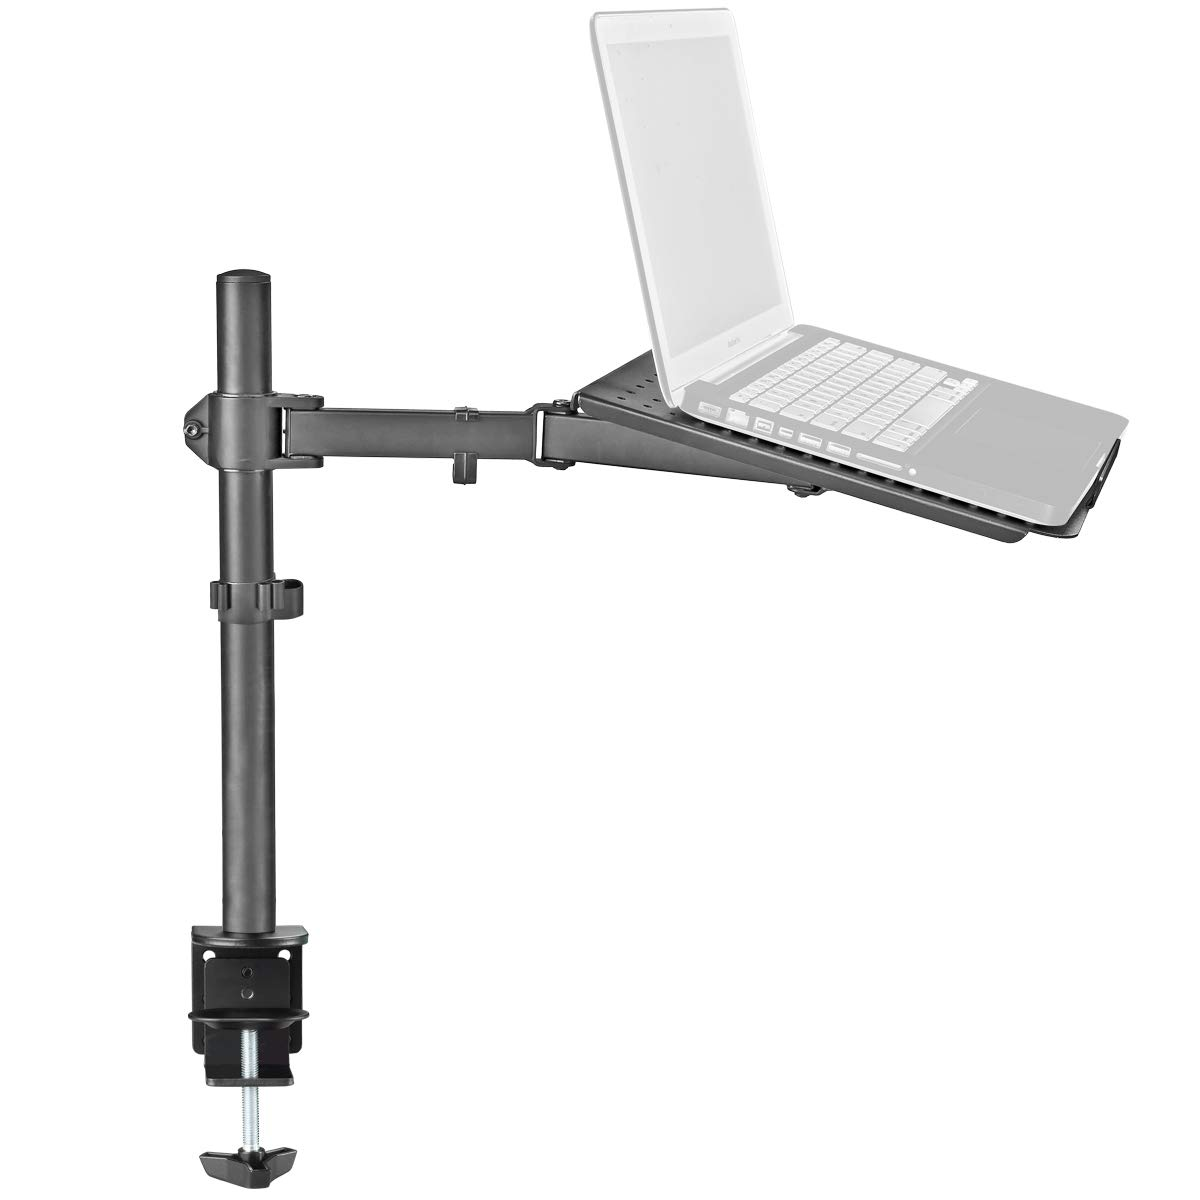 Bracwiser Laptop Notebook Stand Desk C-clamp Mount Fully Adjustable Tilt Swivel Rotation